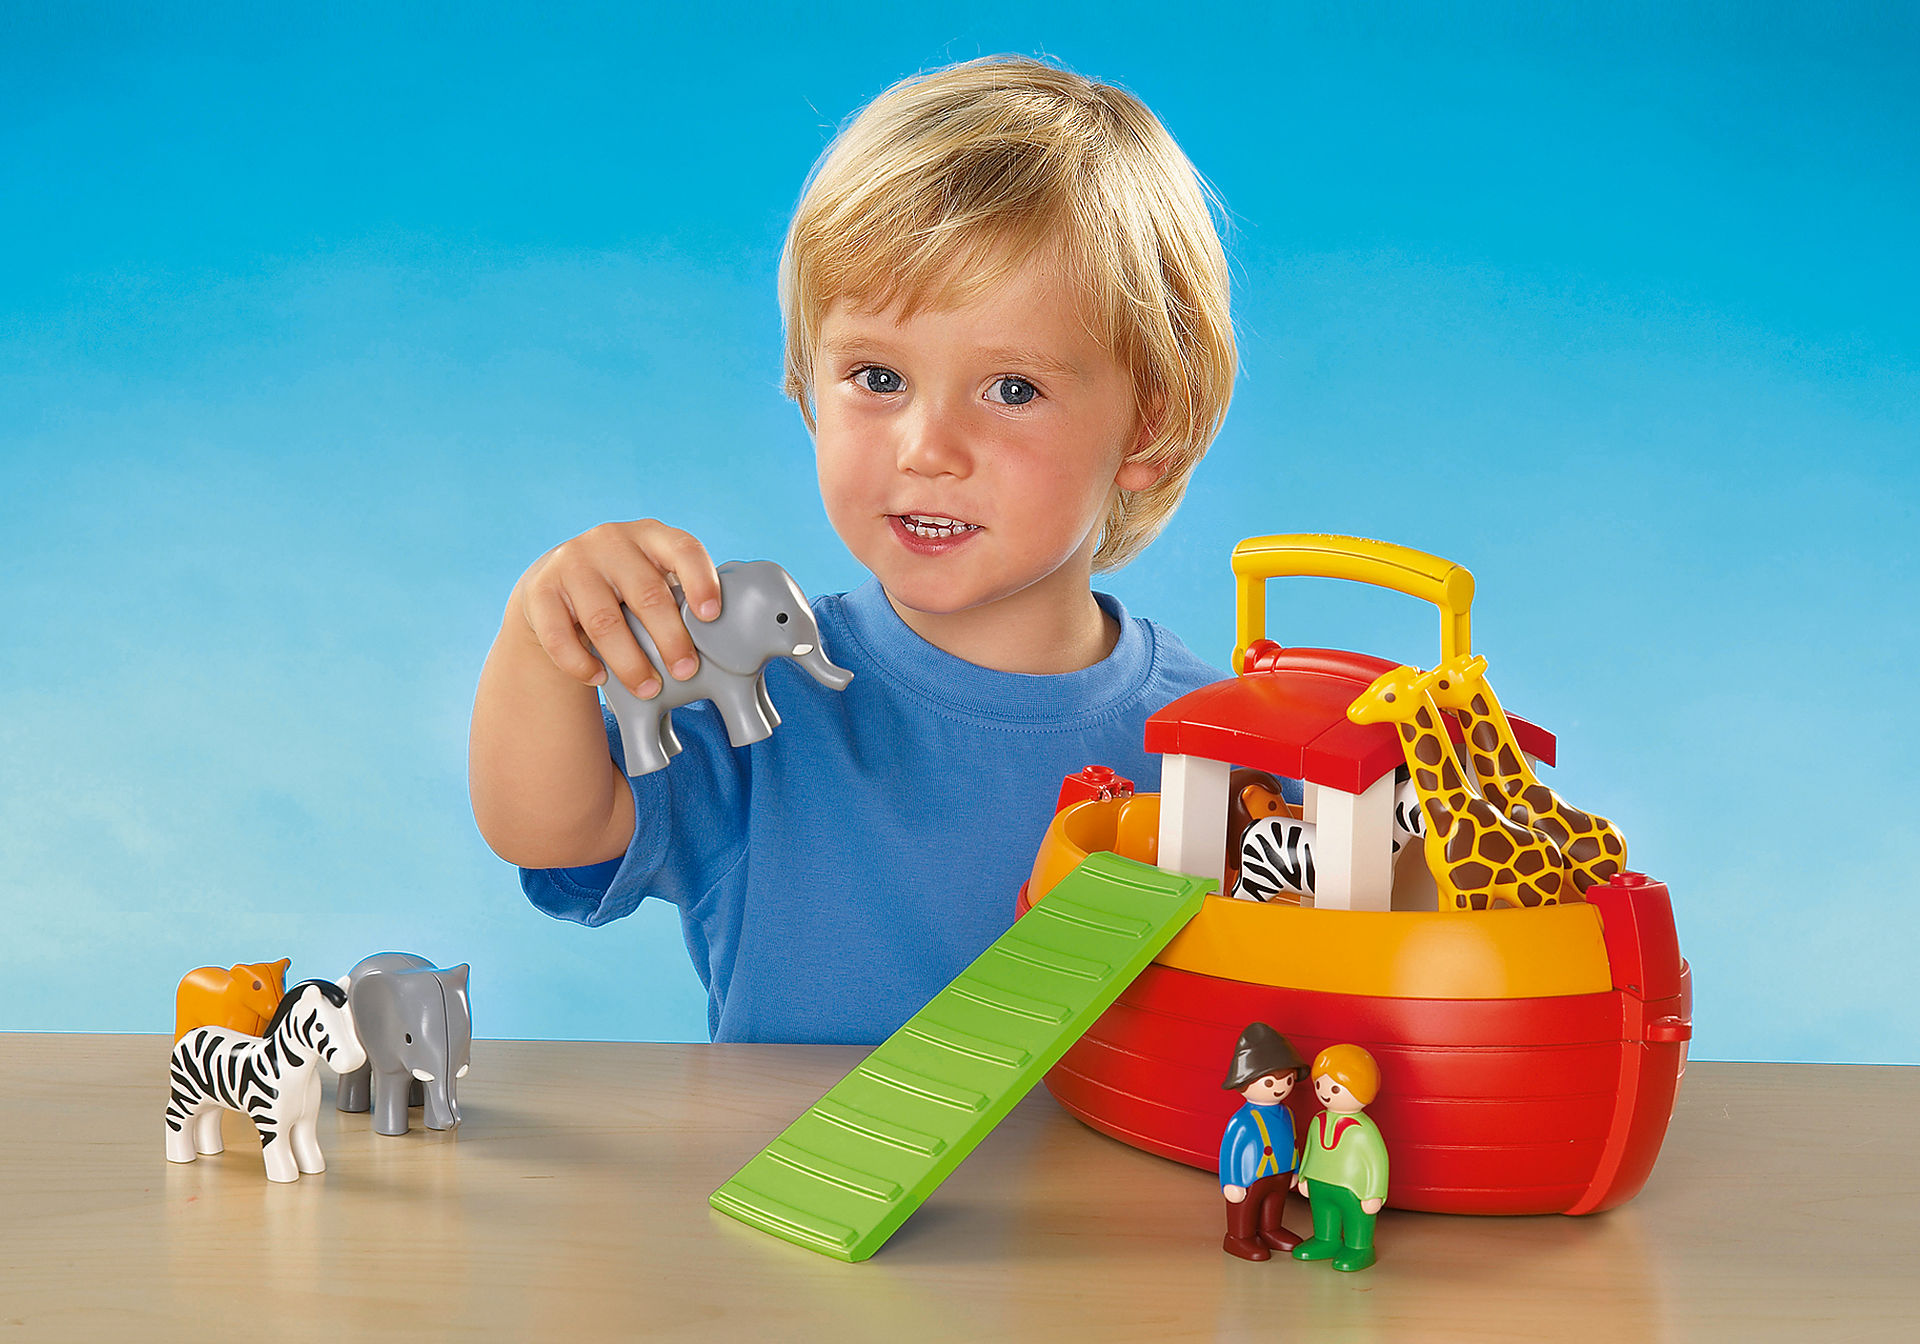 http://media.playmobil.com/i/playmobil/6765_product_extra1/Meine Mitnehm-Arche Noah